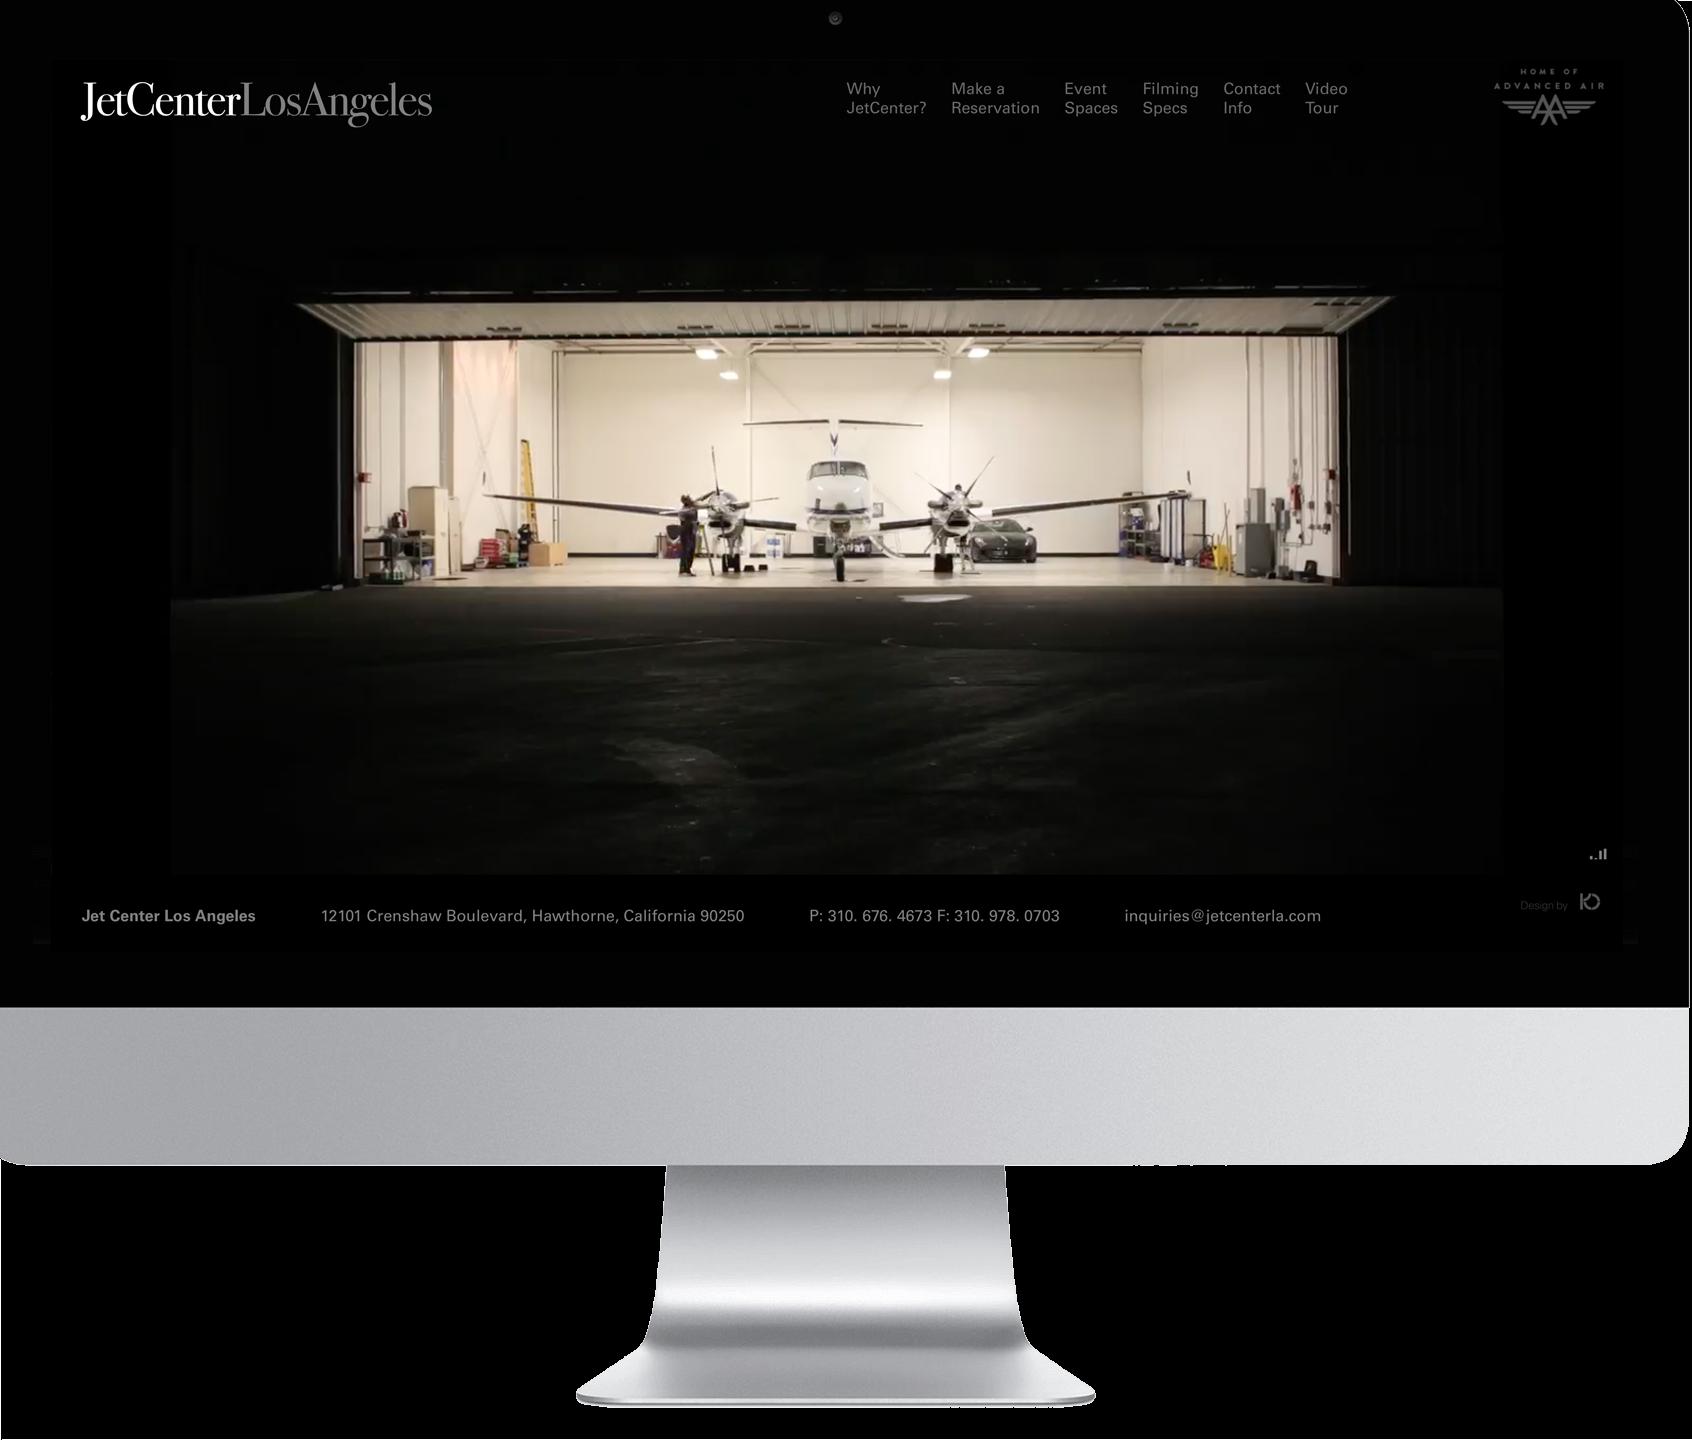 Jet Center Los Angeles